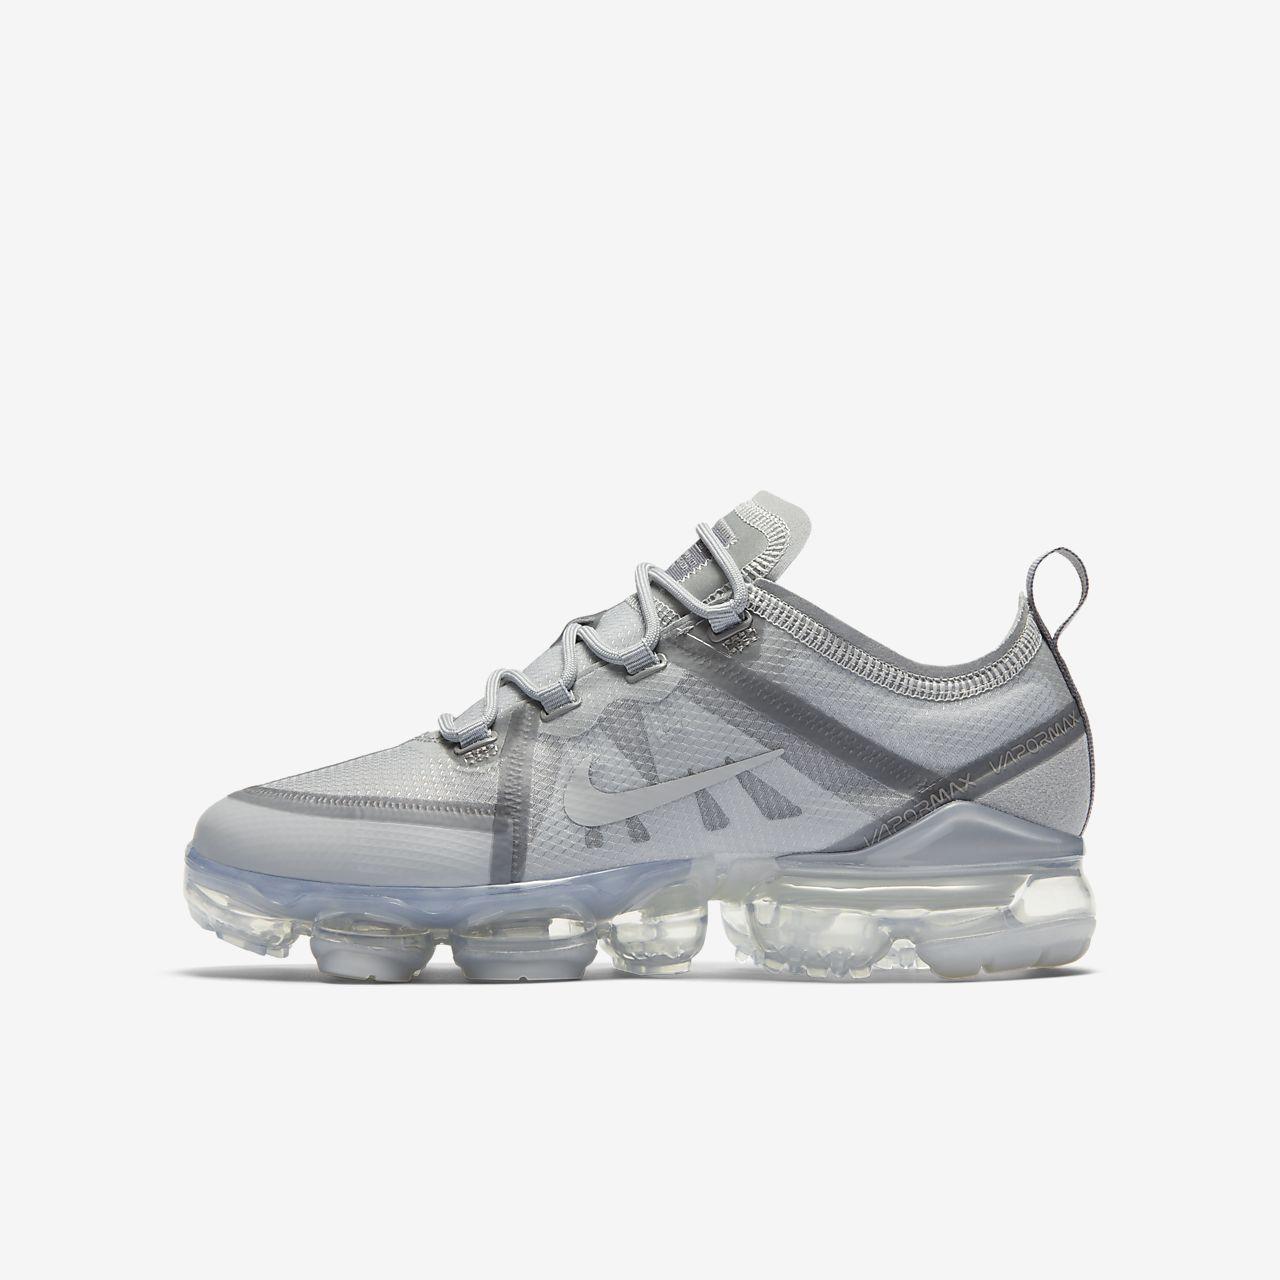 Nike Air VaporMax 2019 Genç Çocuk Ayakkabısı